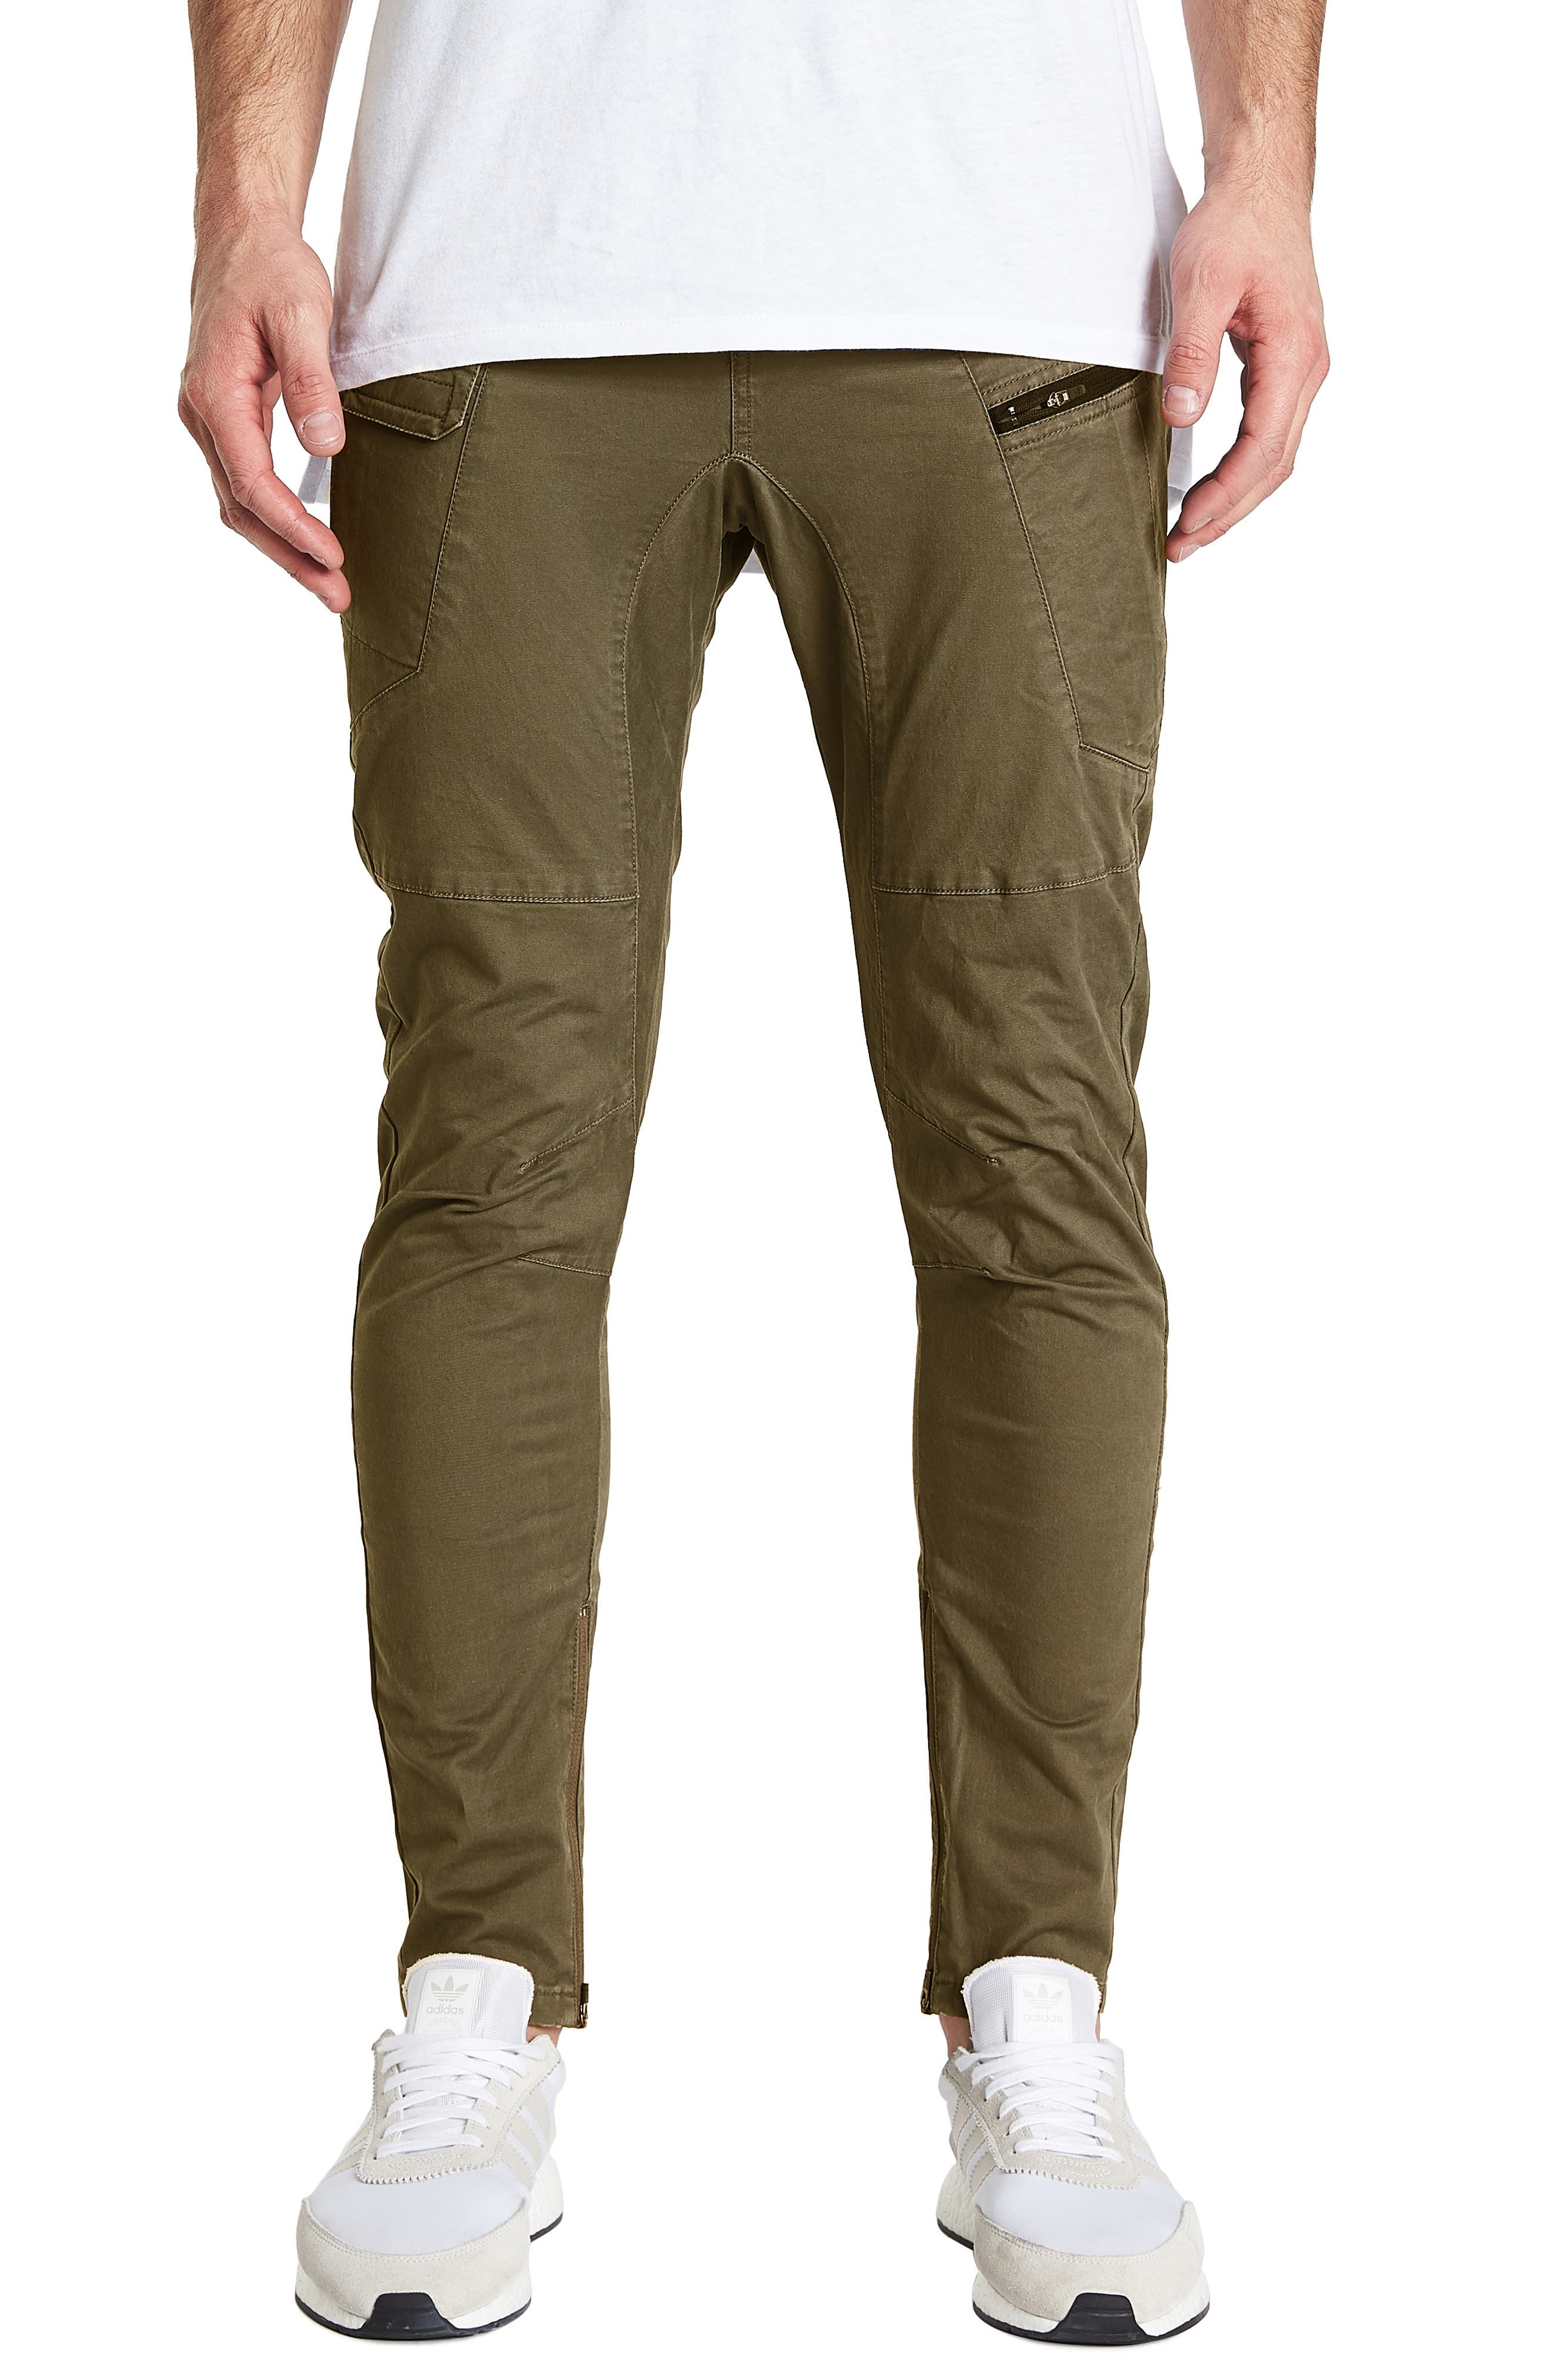 Tactical Slim Fit Pants,                         Main,                         color, IVY GREEN